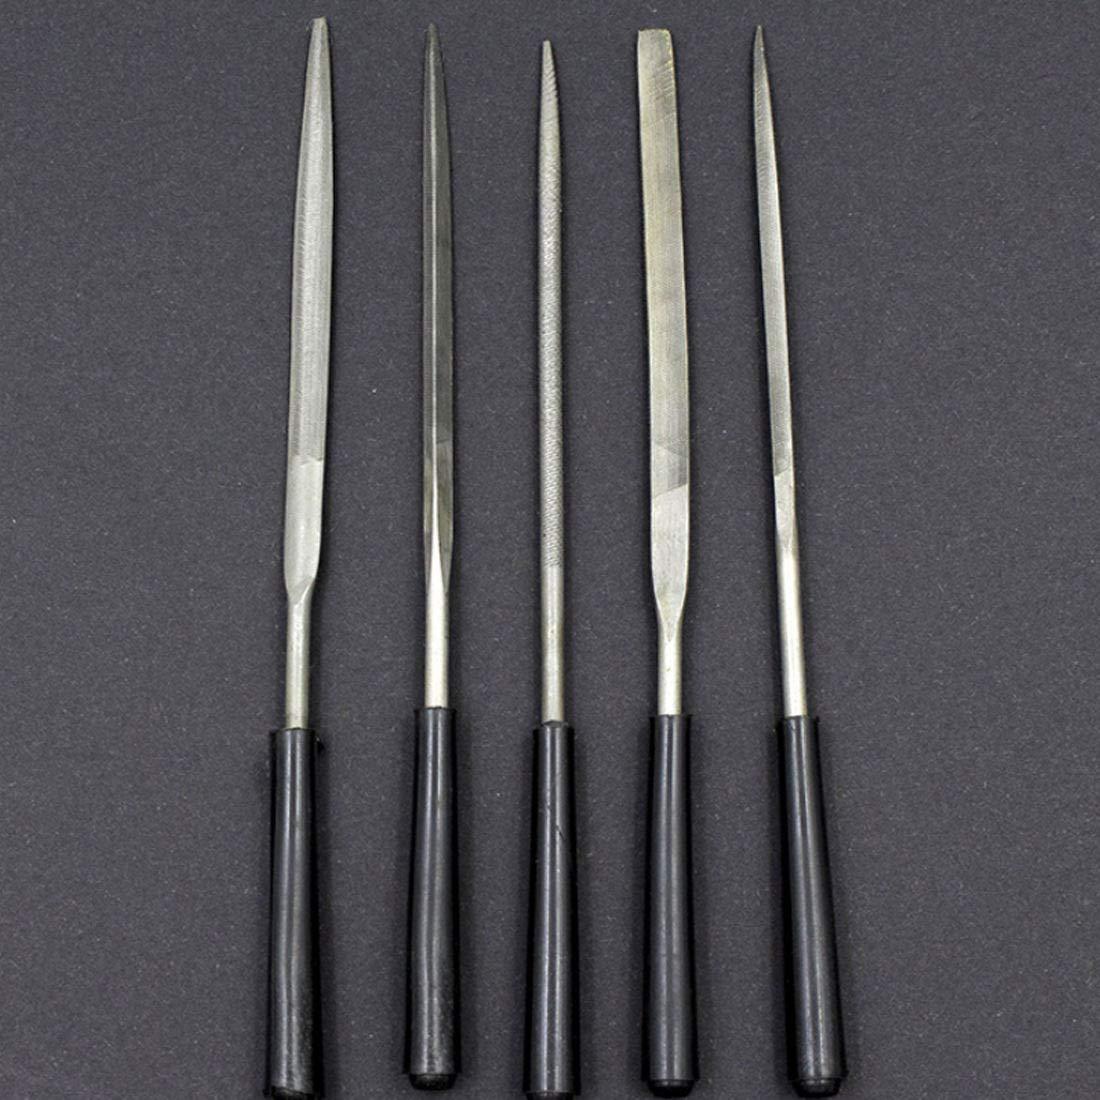 5pcs Needle Files Set for Jeweler Diamond Carving Wood Metal Glass Stone Craft